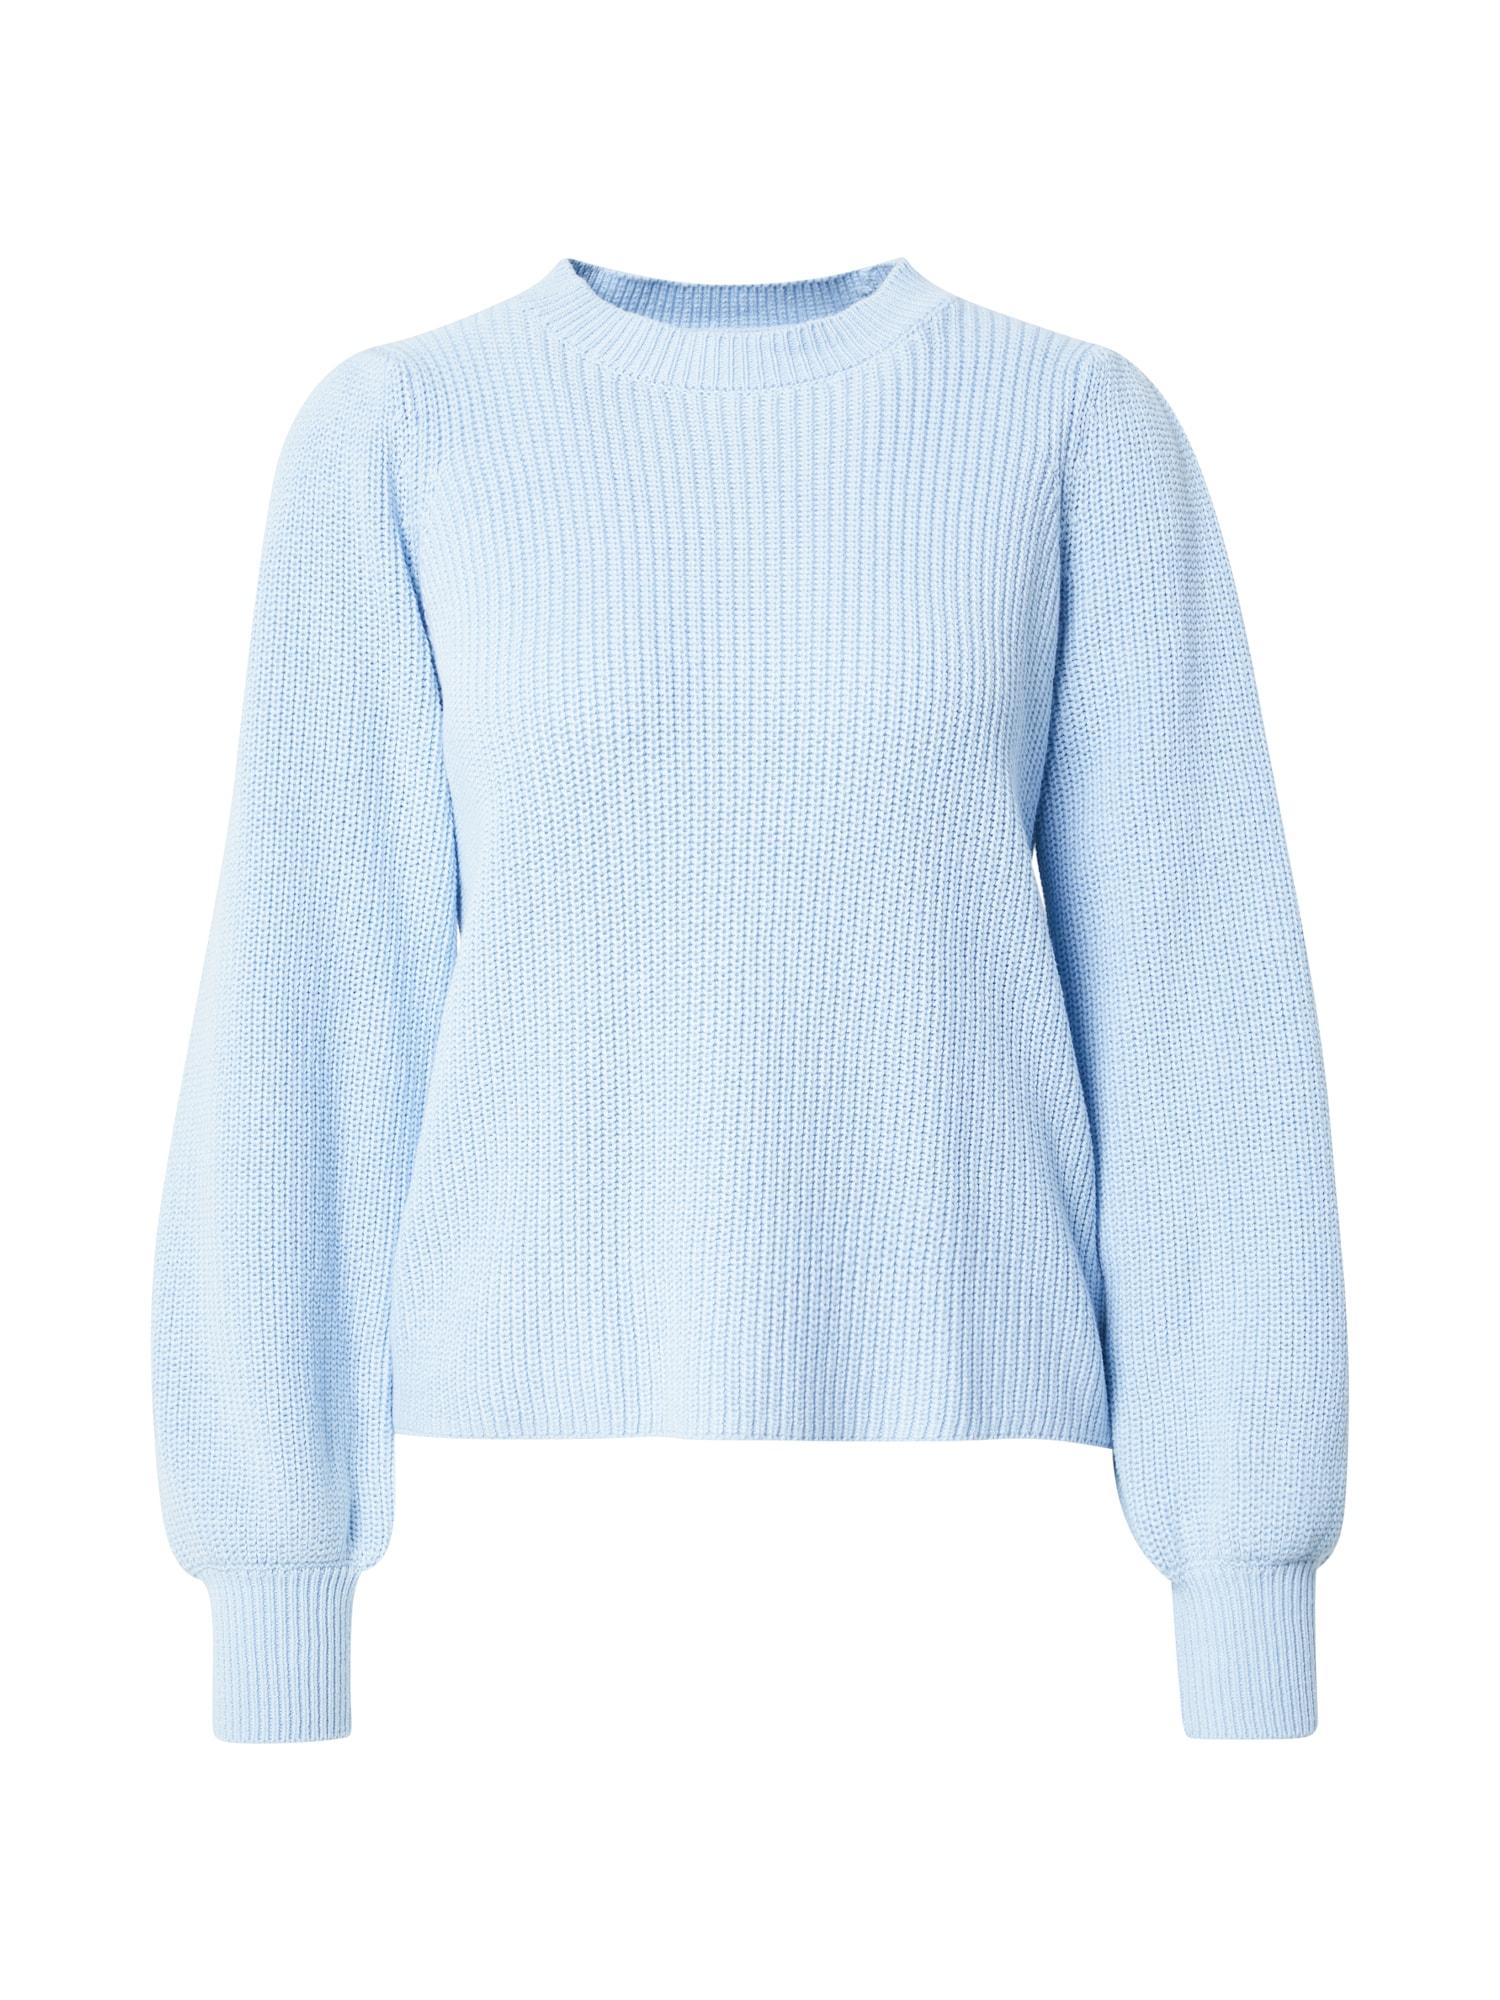 Moves Megztinis šviesiai mėlyna